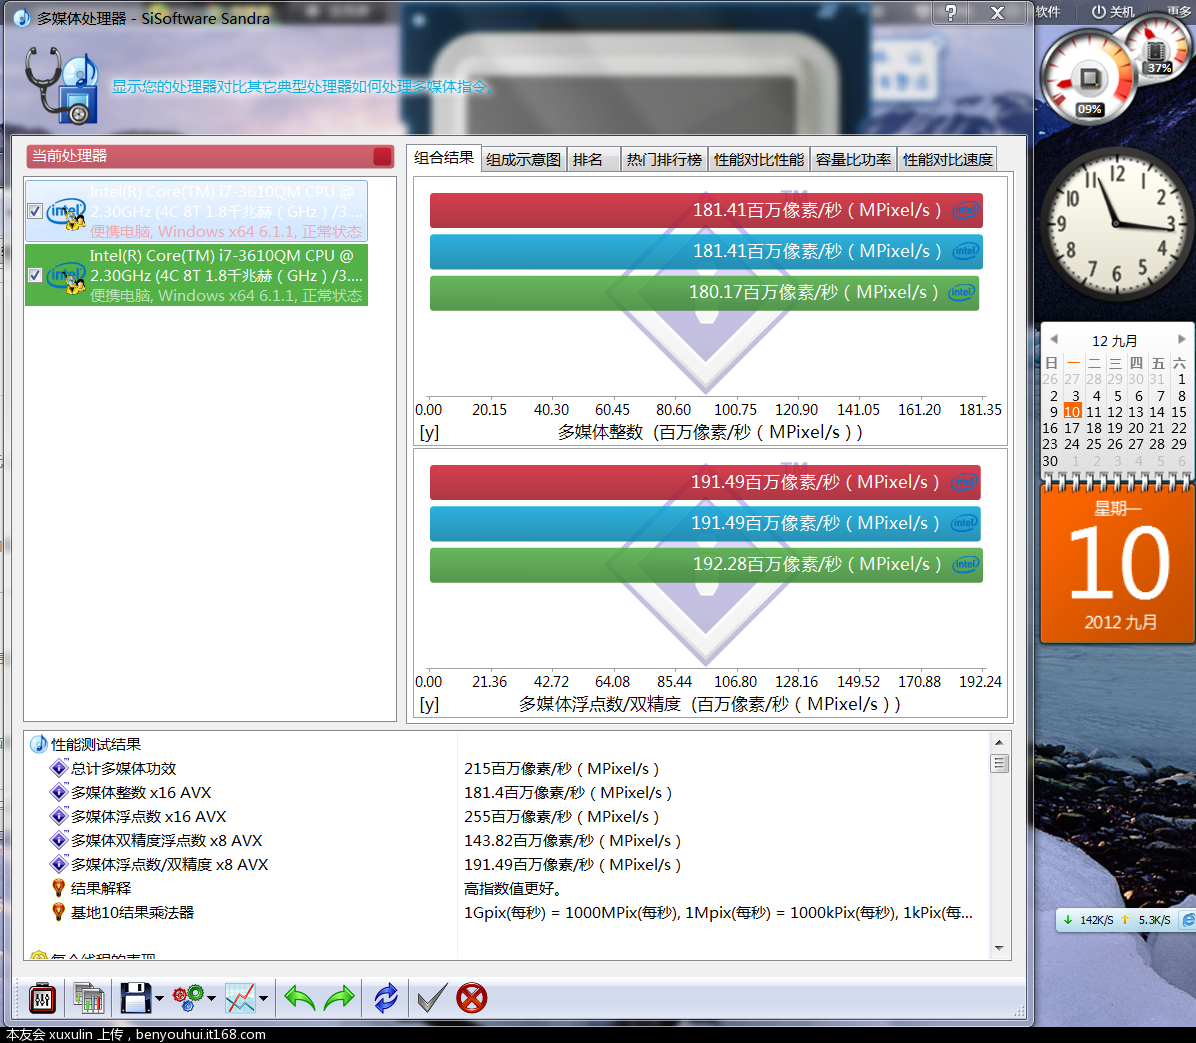 Sisoftware Sandra 截图15.PNG